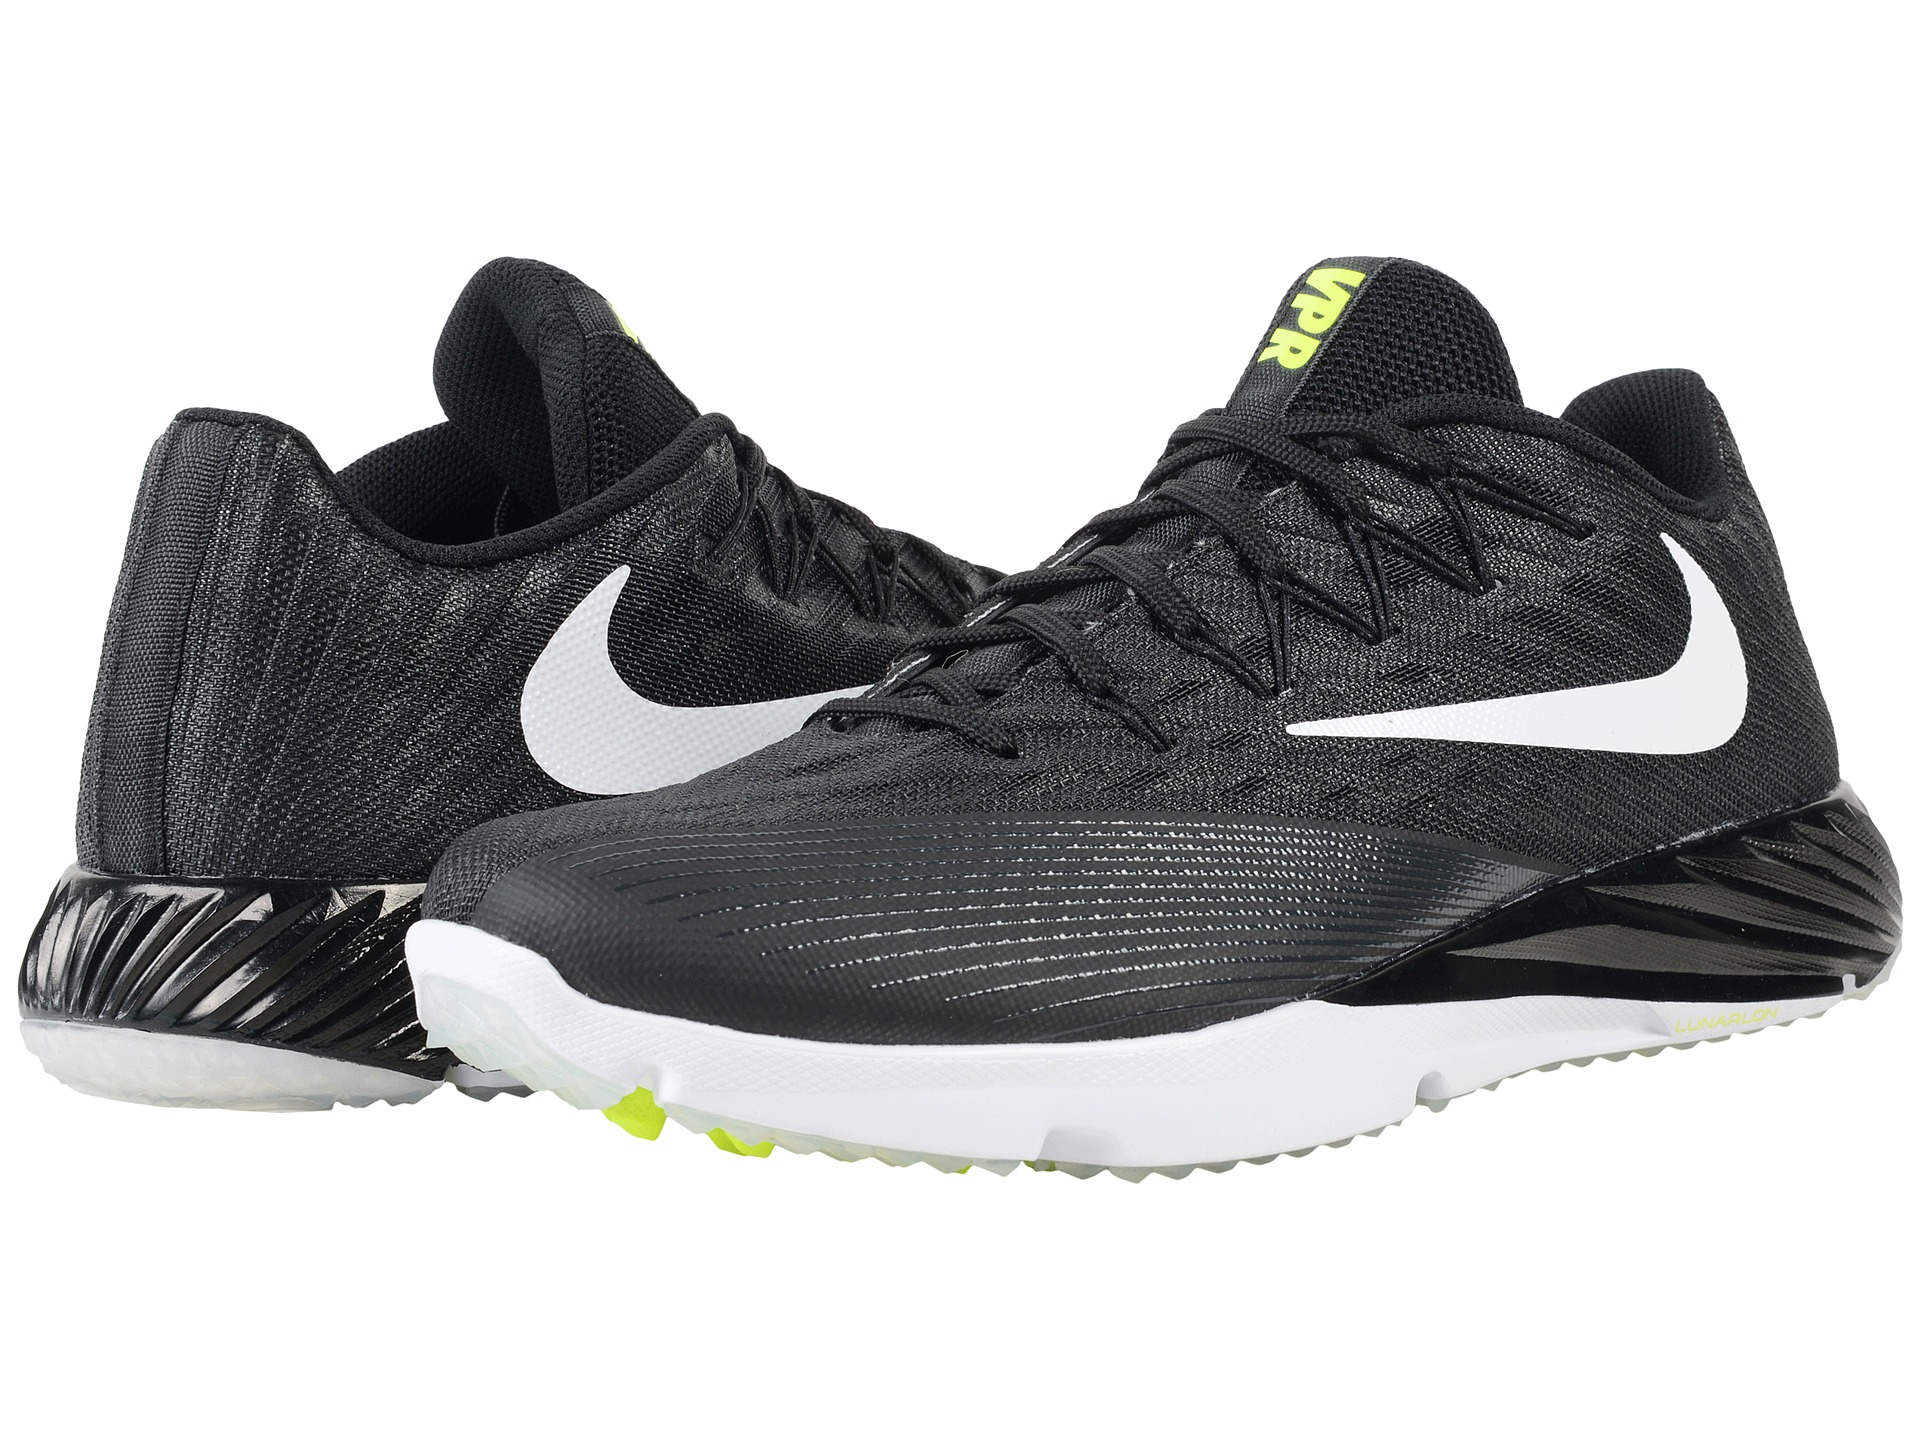 76d19538a61 Nike vapor speed turf in black for men hot product af jpg 1920x1440 Nike  speed turf